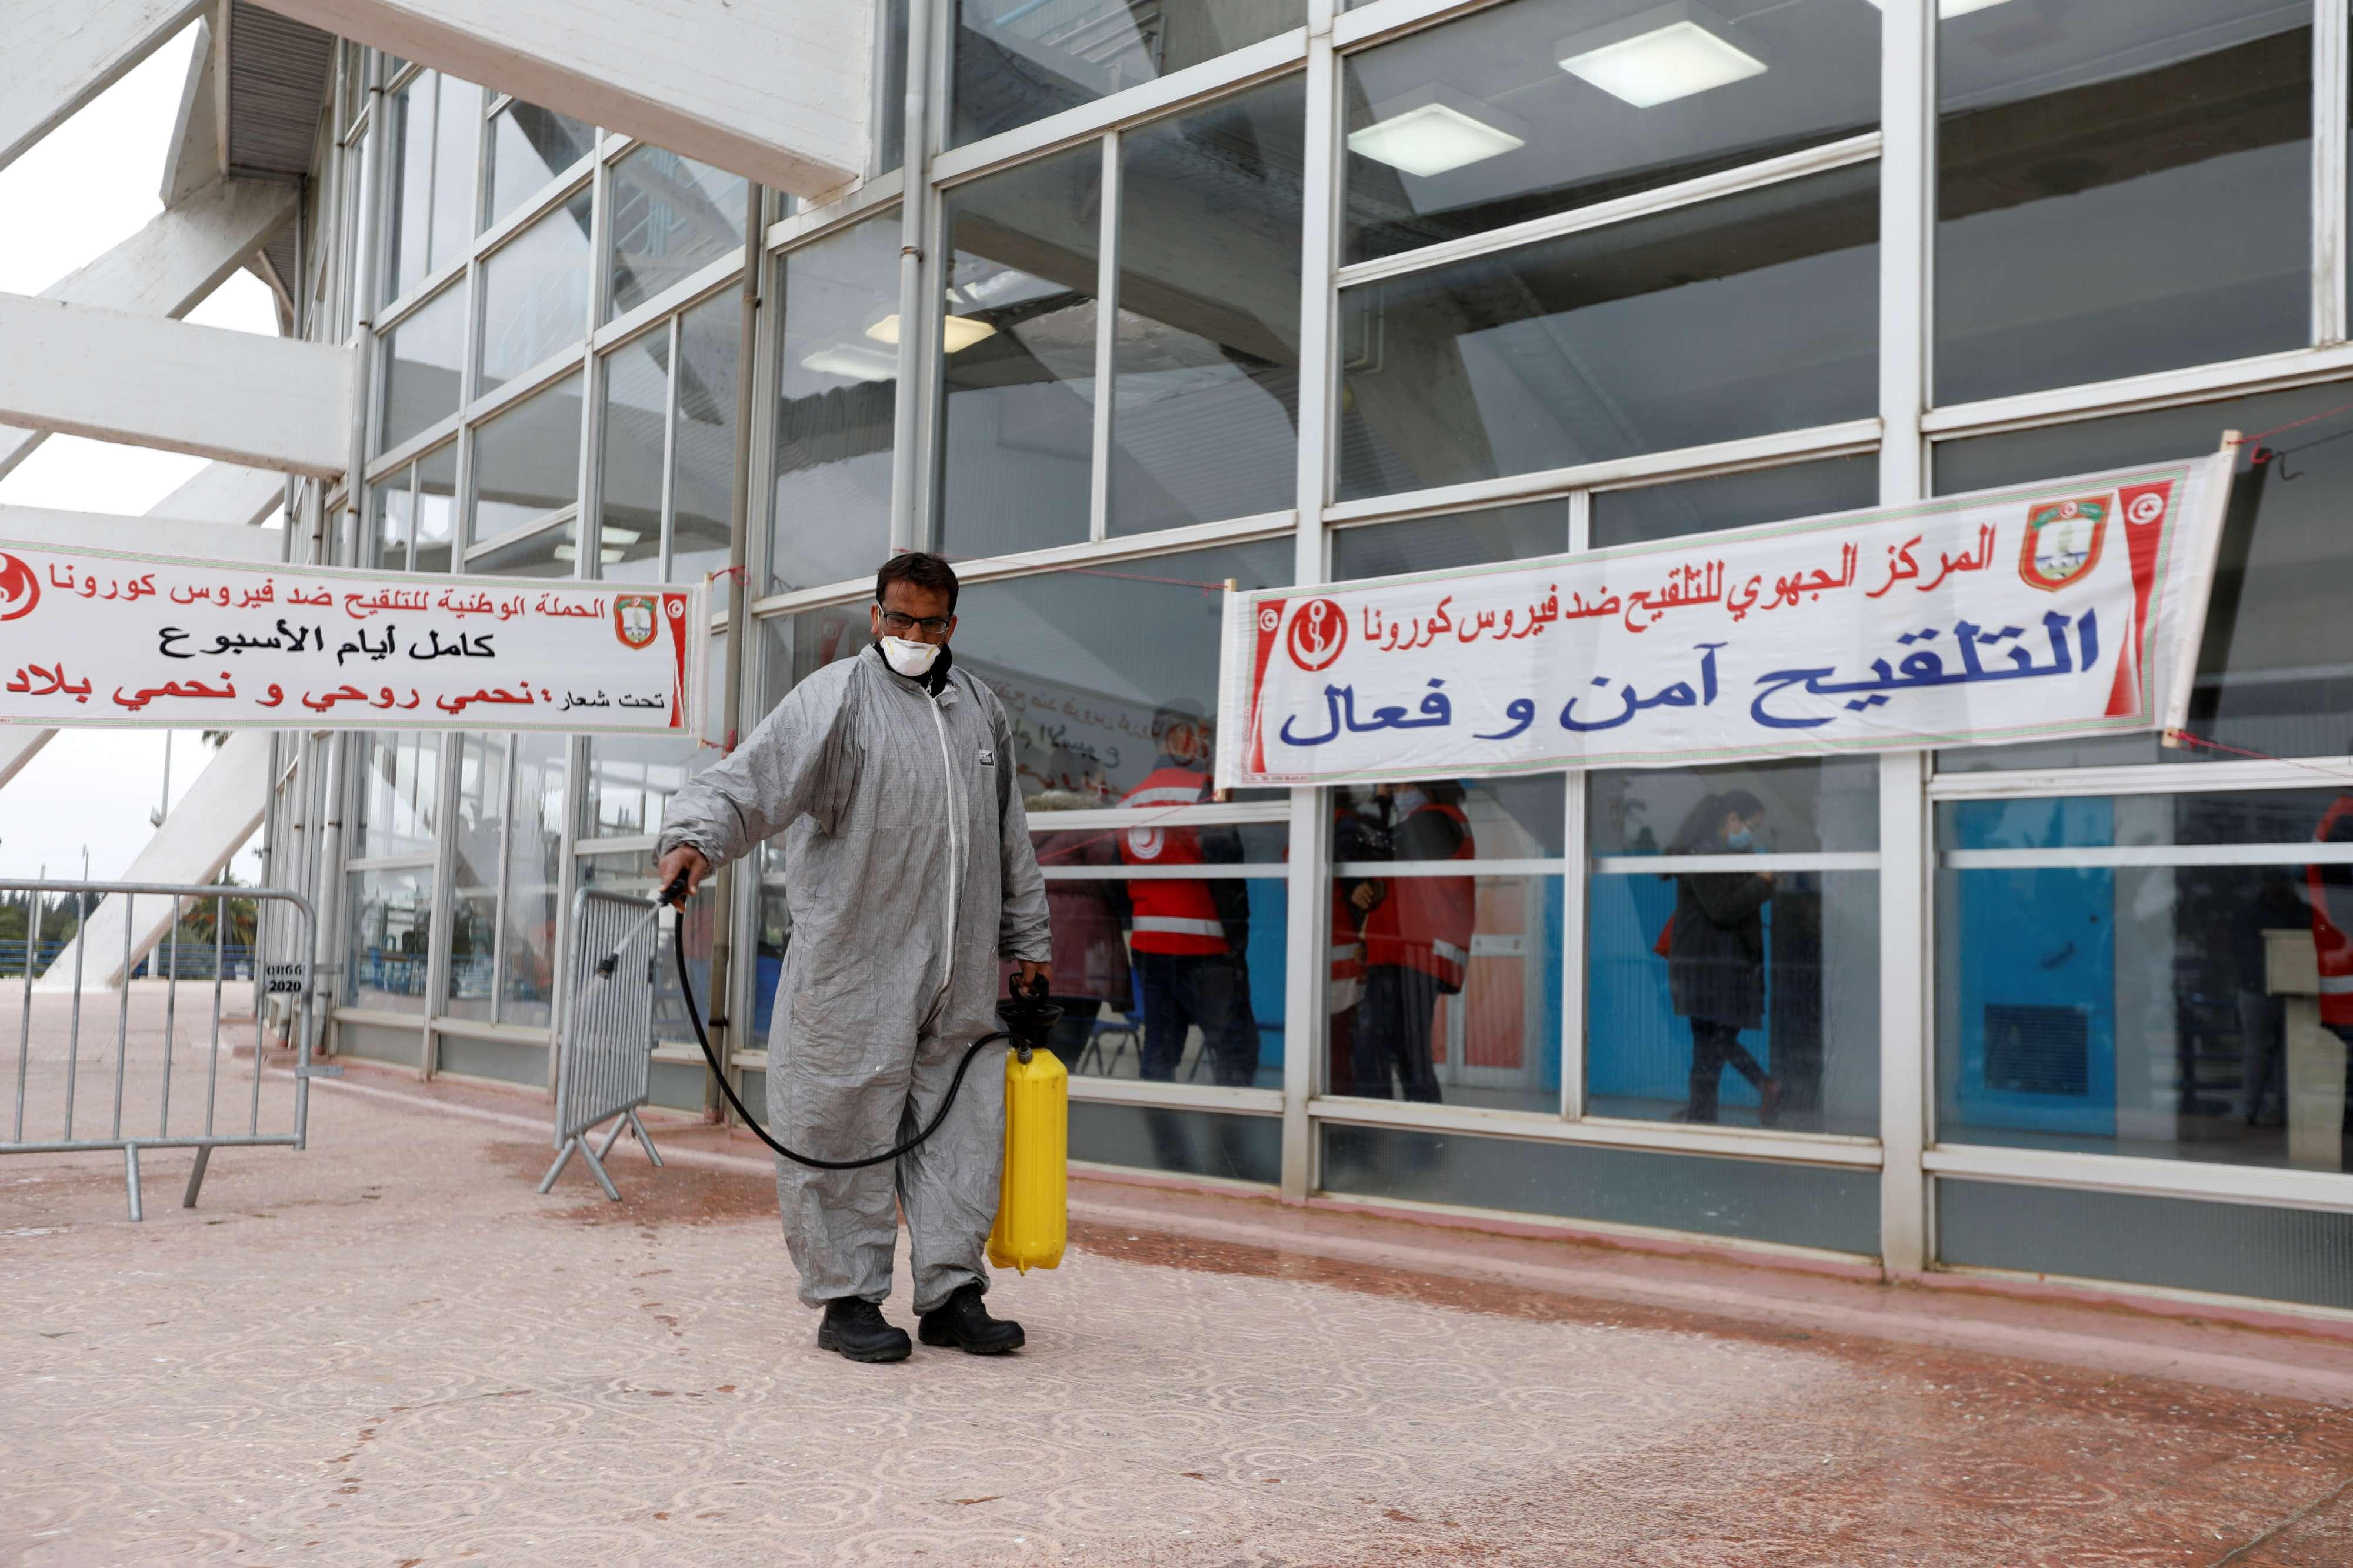 20210313101328reup--2021-03-13t101209z_693658087_rc2aam9mjjvp_rtrmadp_3_health-coronavirus-tunisia.h